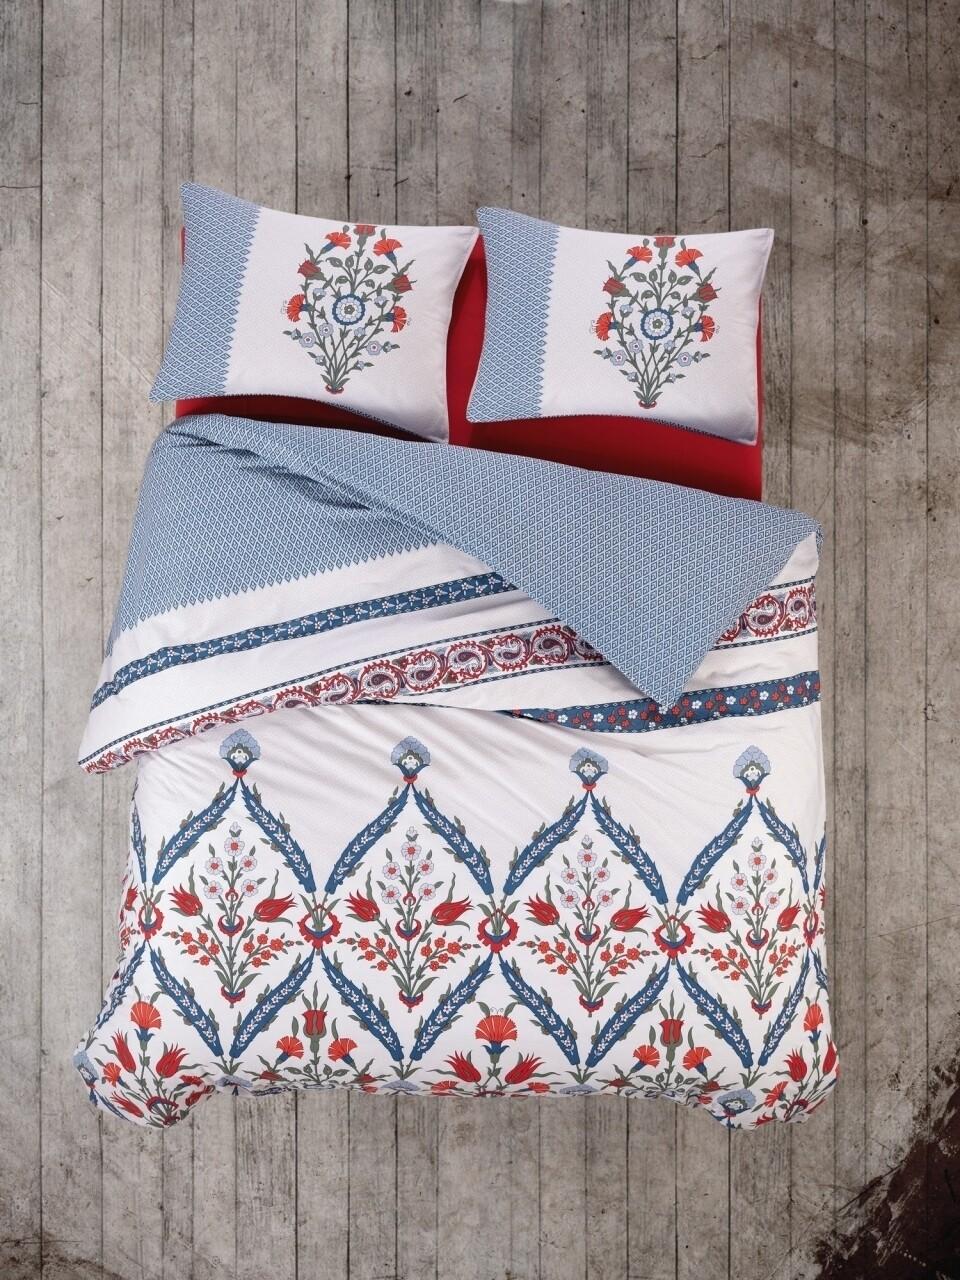 Lenjerie de pat pentru o persoana, 3 piese, 100% bumbac ranforce, Cotton Box, Mahber